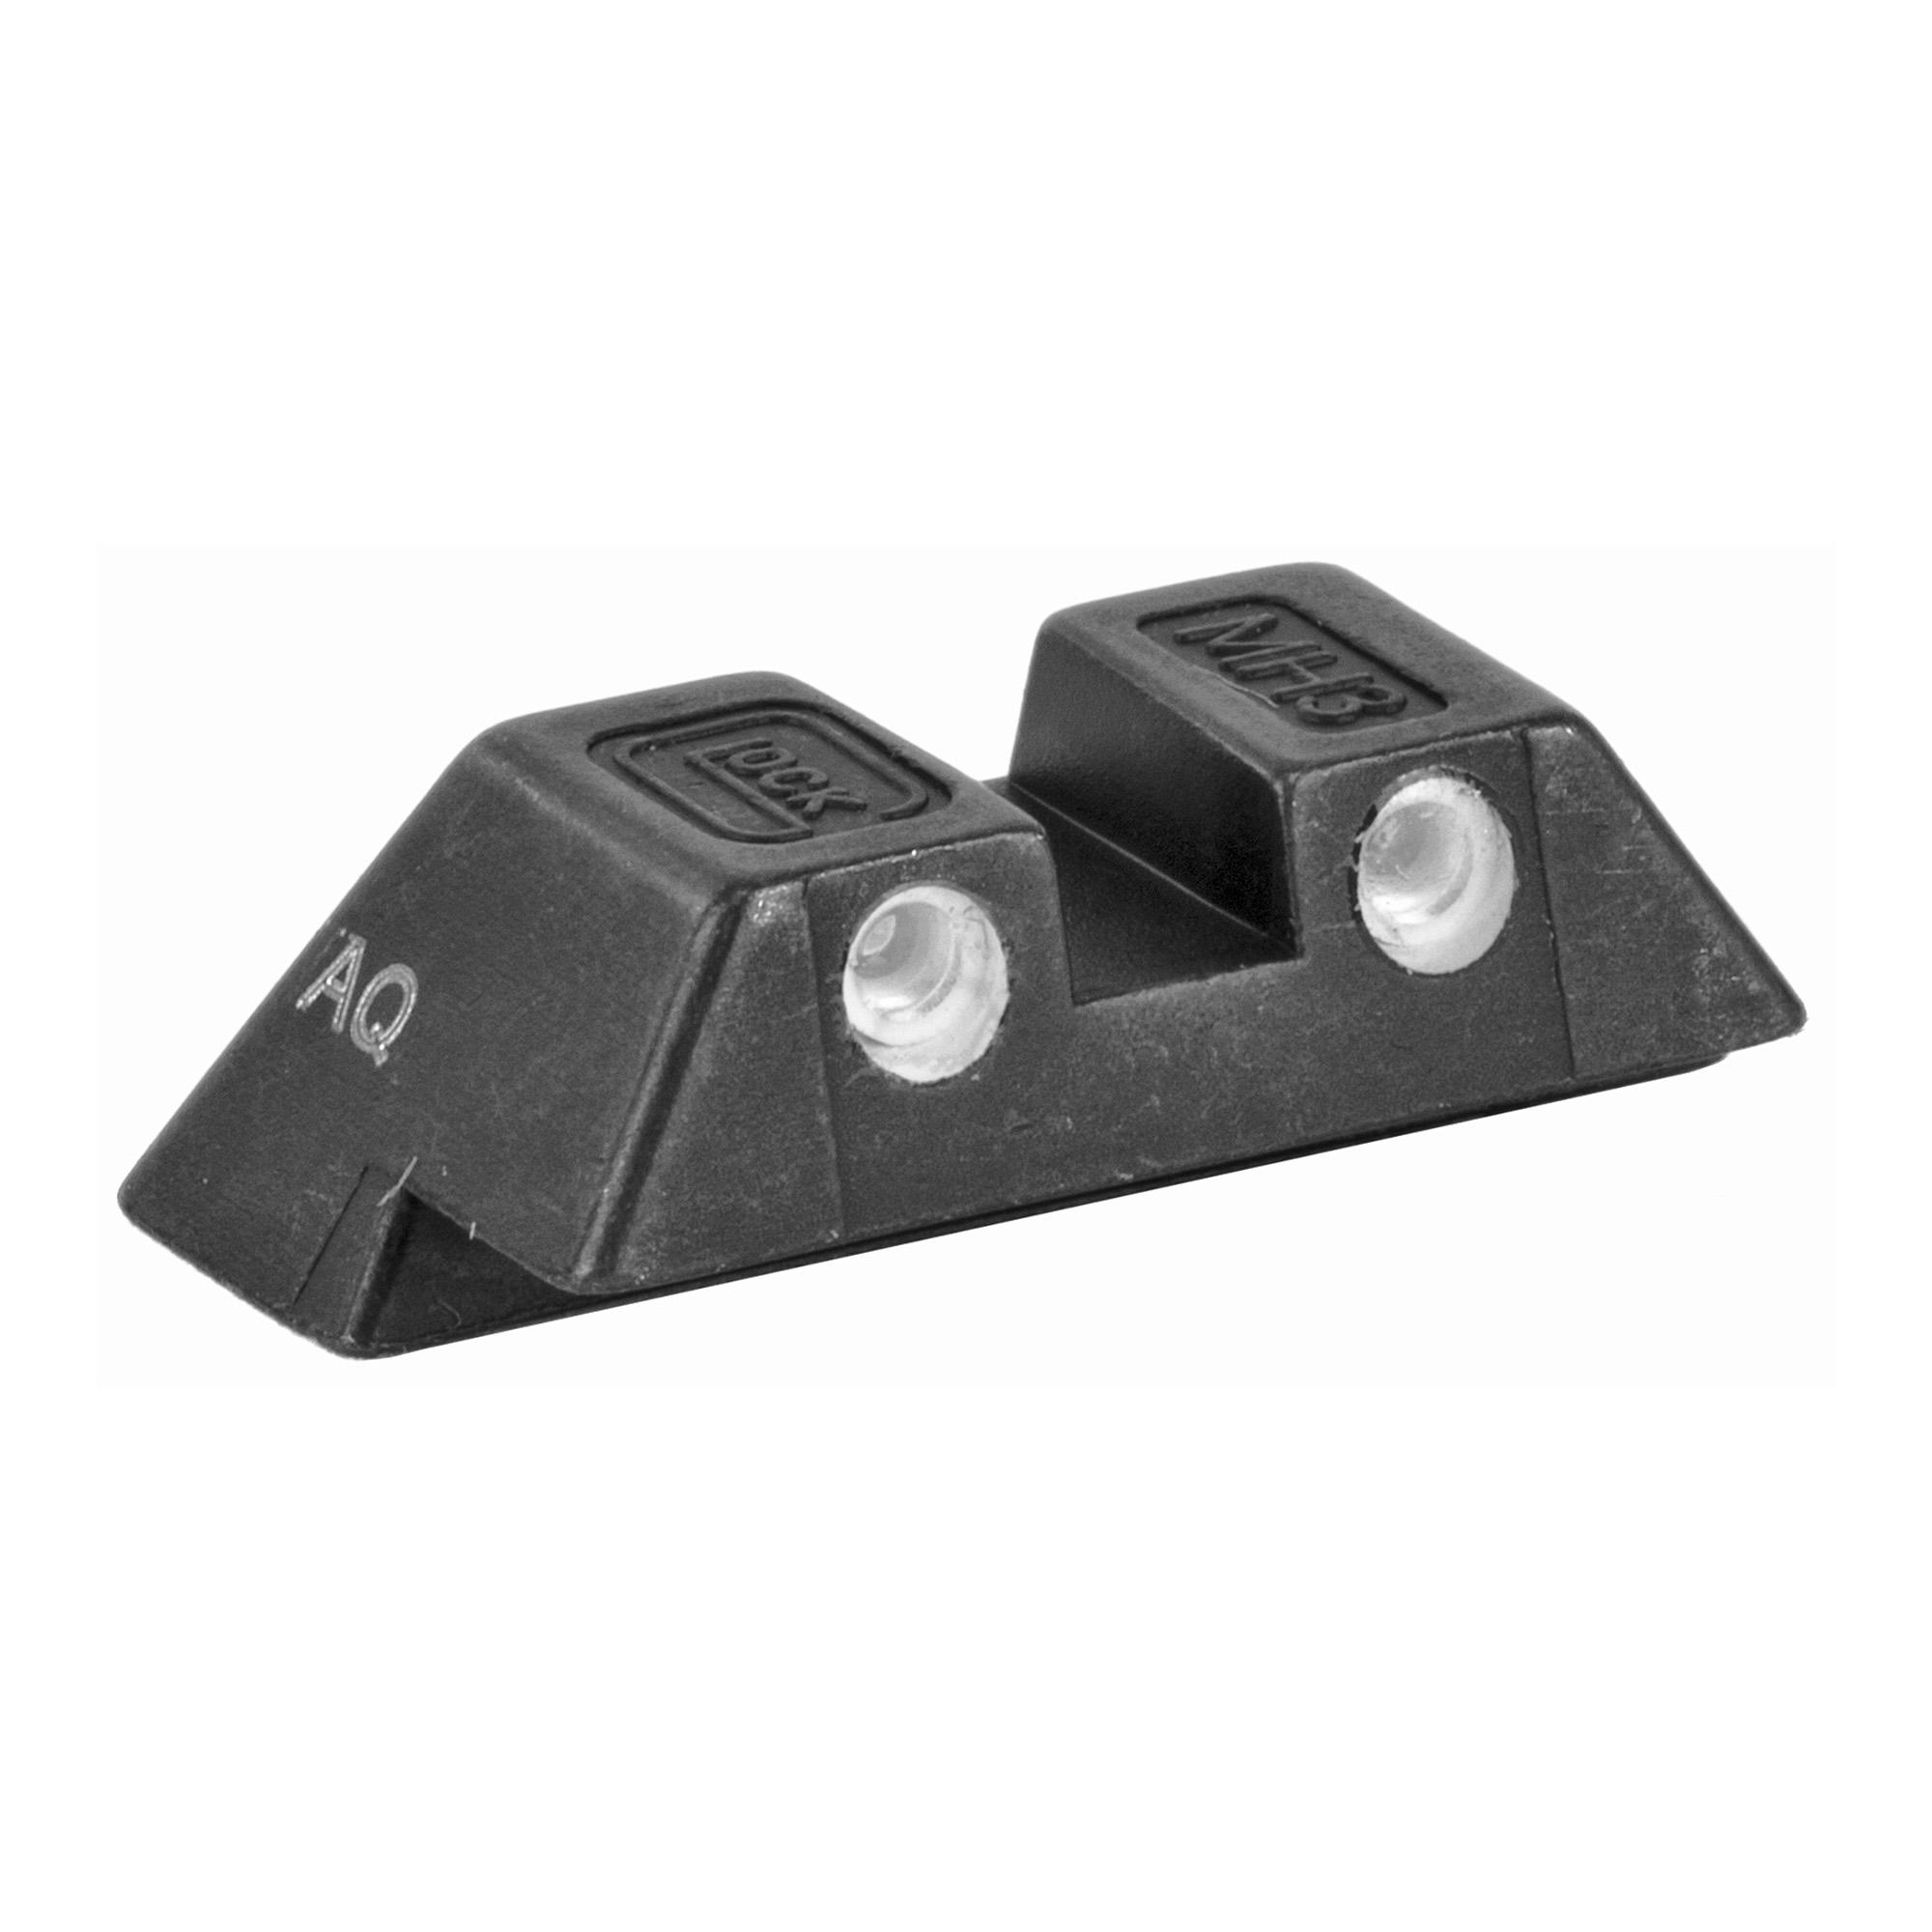 Glock Oem Night Sight Rear Only 6.9